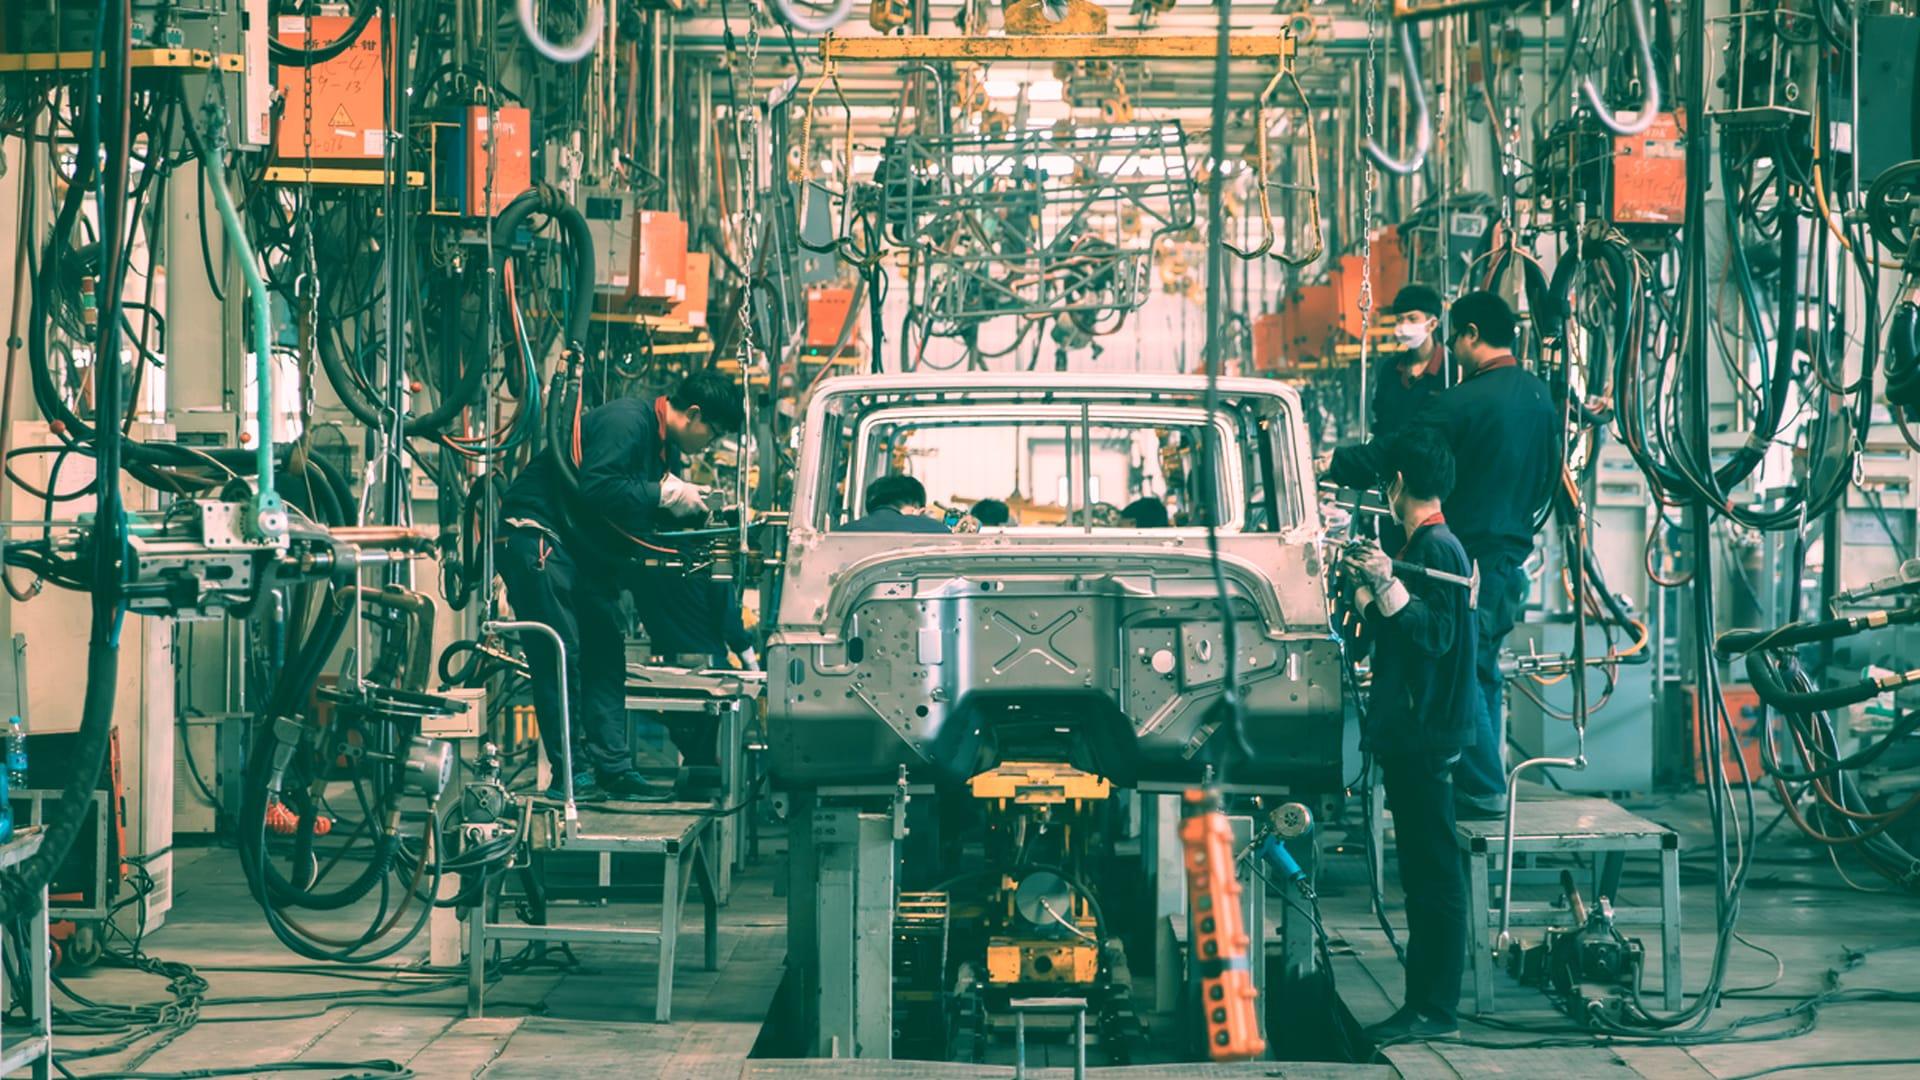 K'taka govt prohibits workers strike at Toyota Kirloskar Motor plant, asks management to lift lock-out